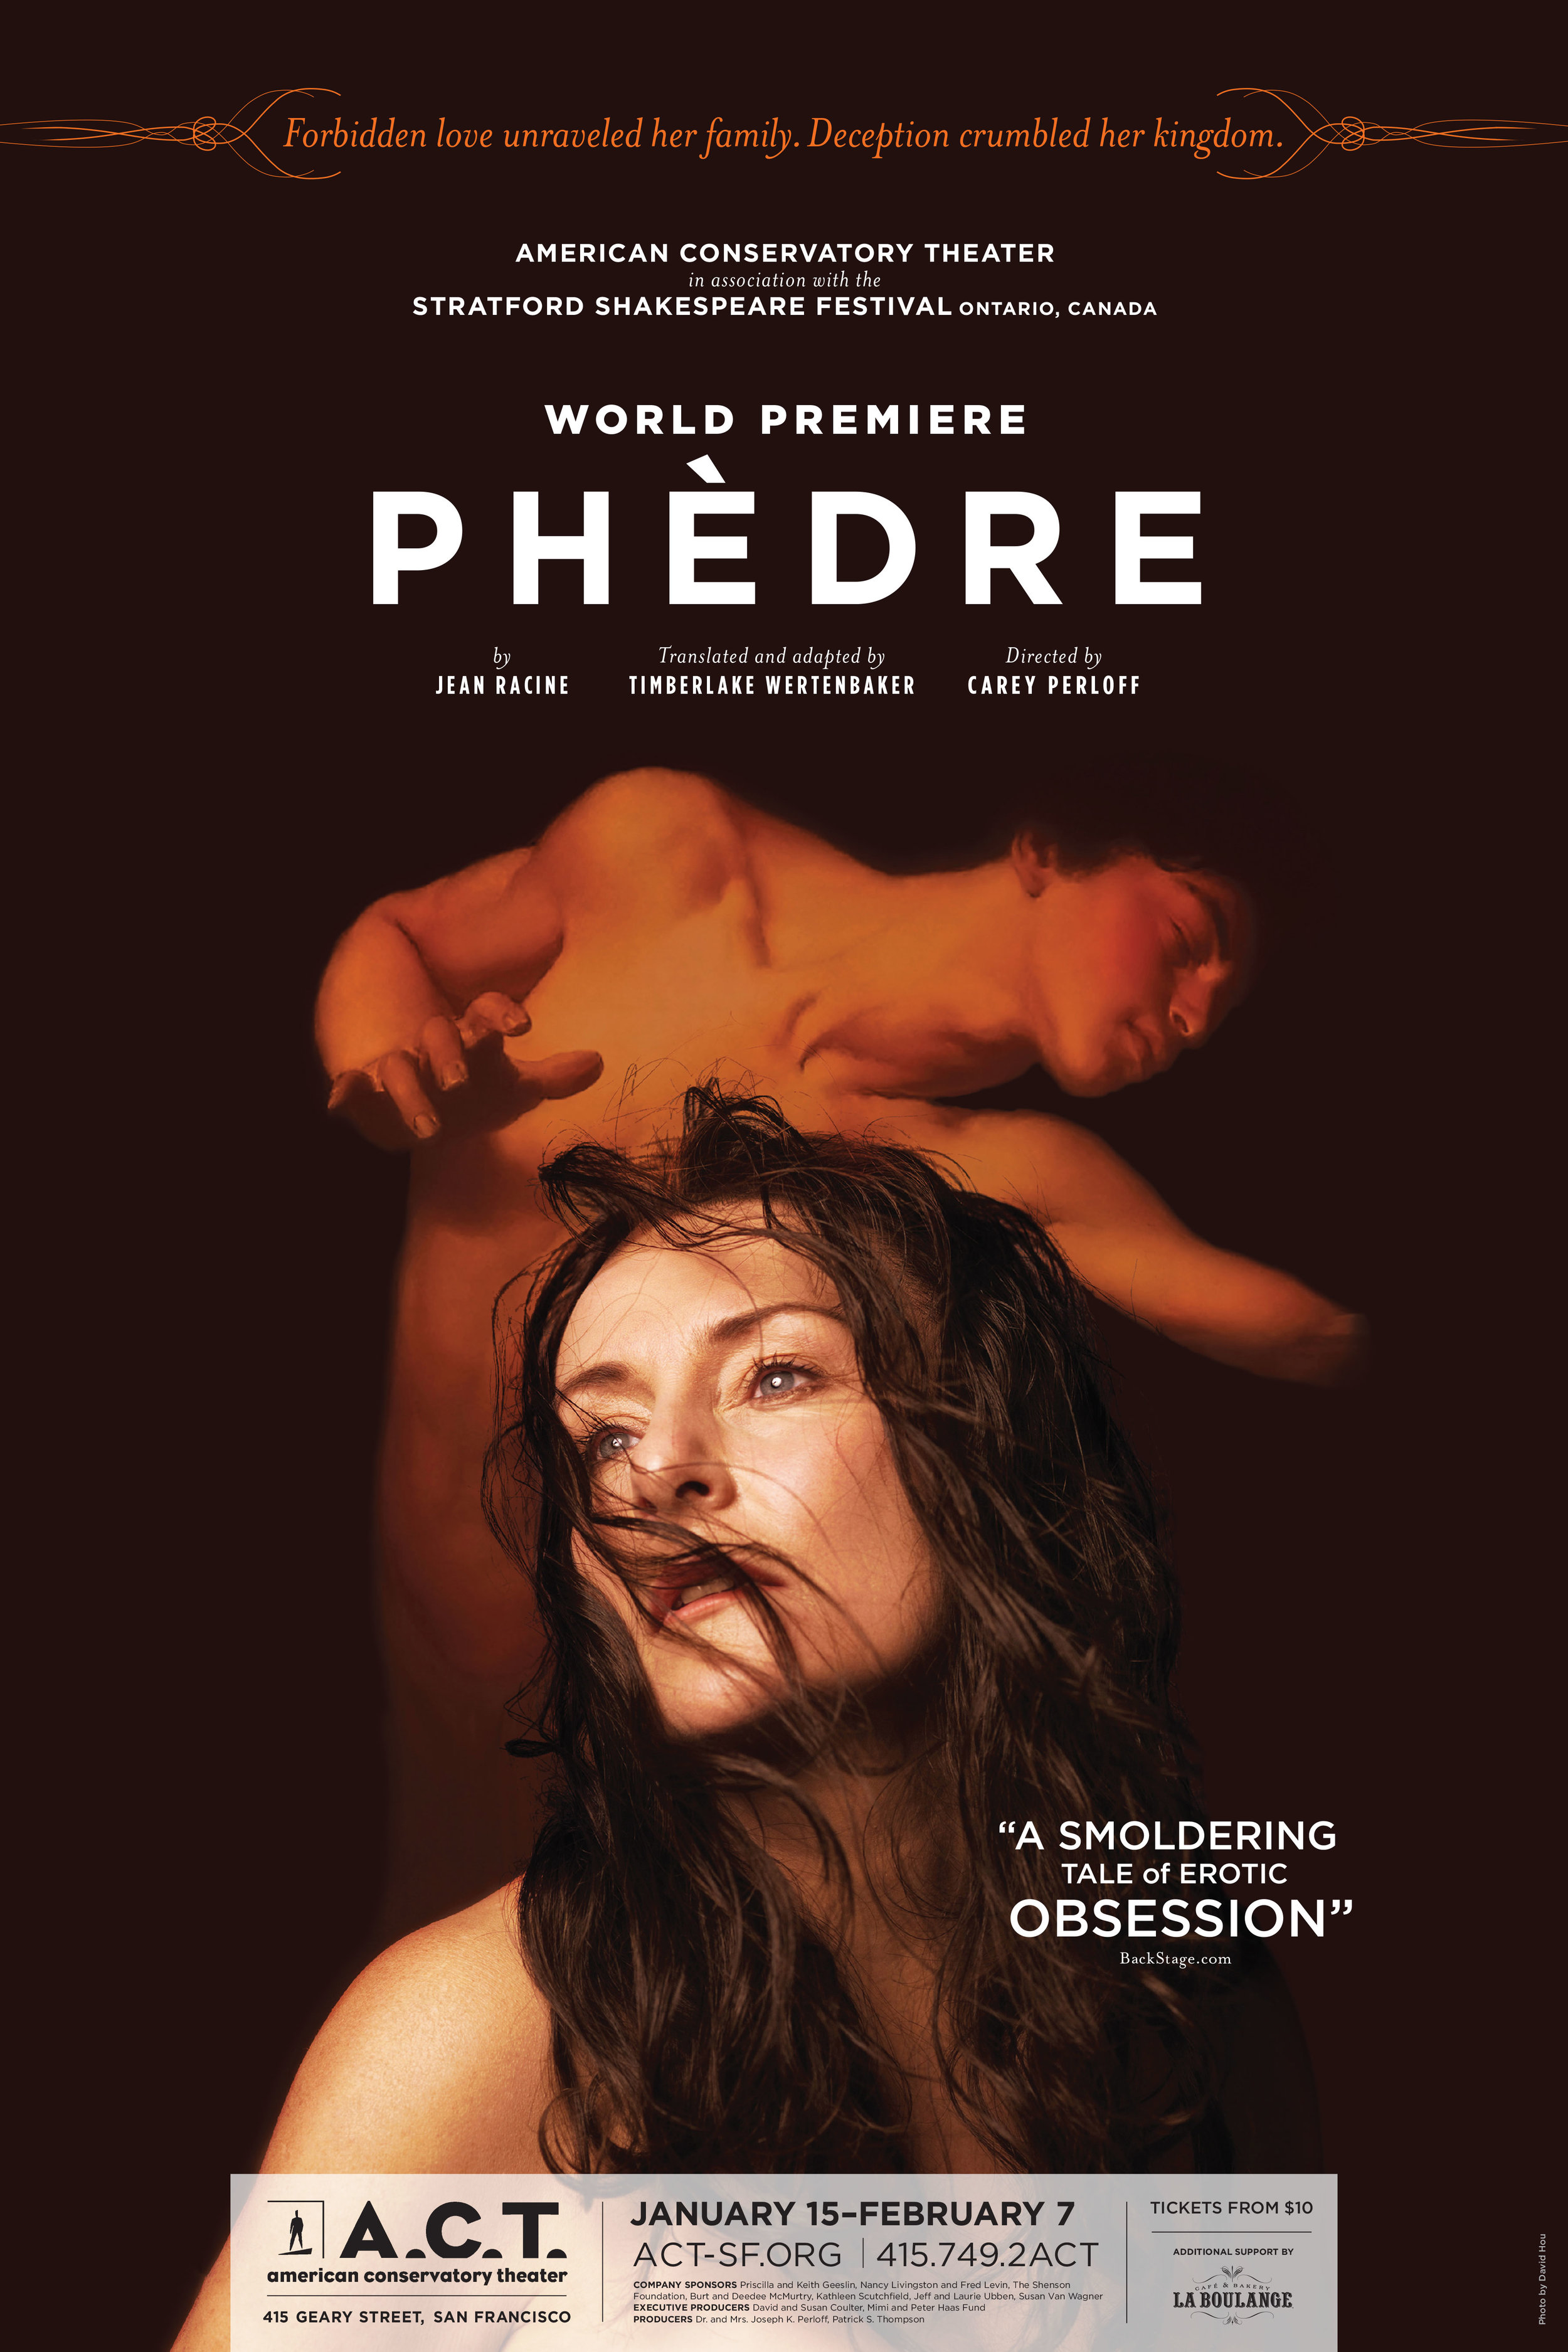 phedre_poster.jpg